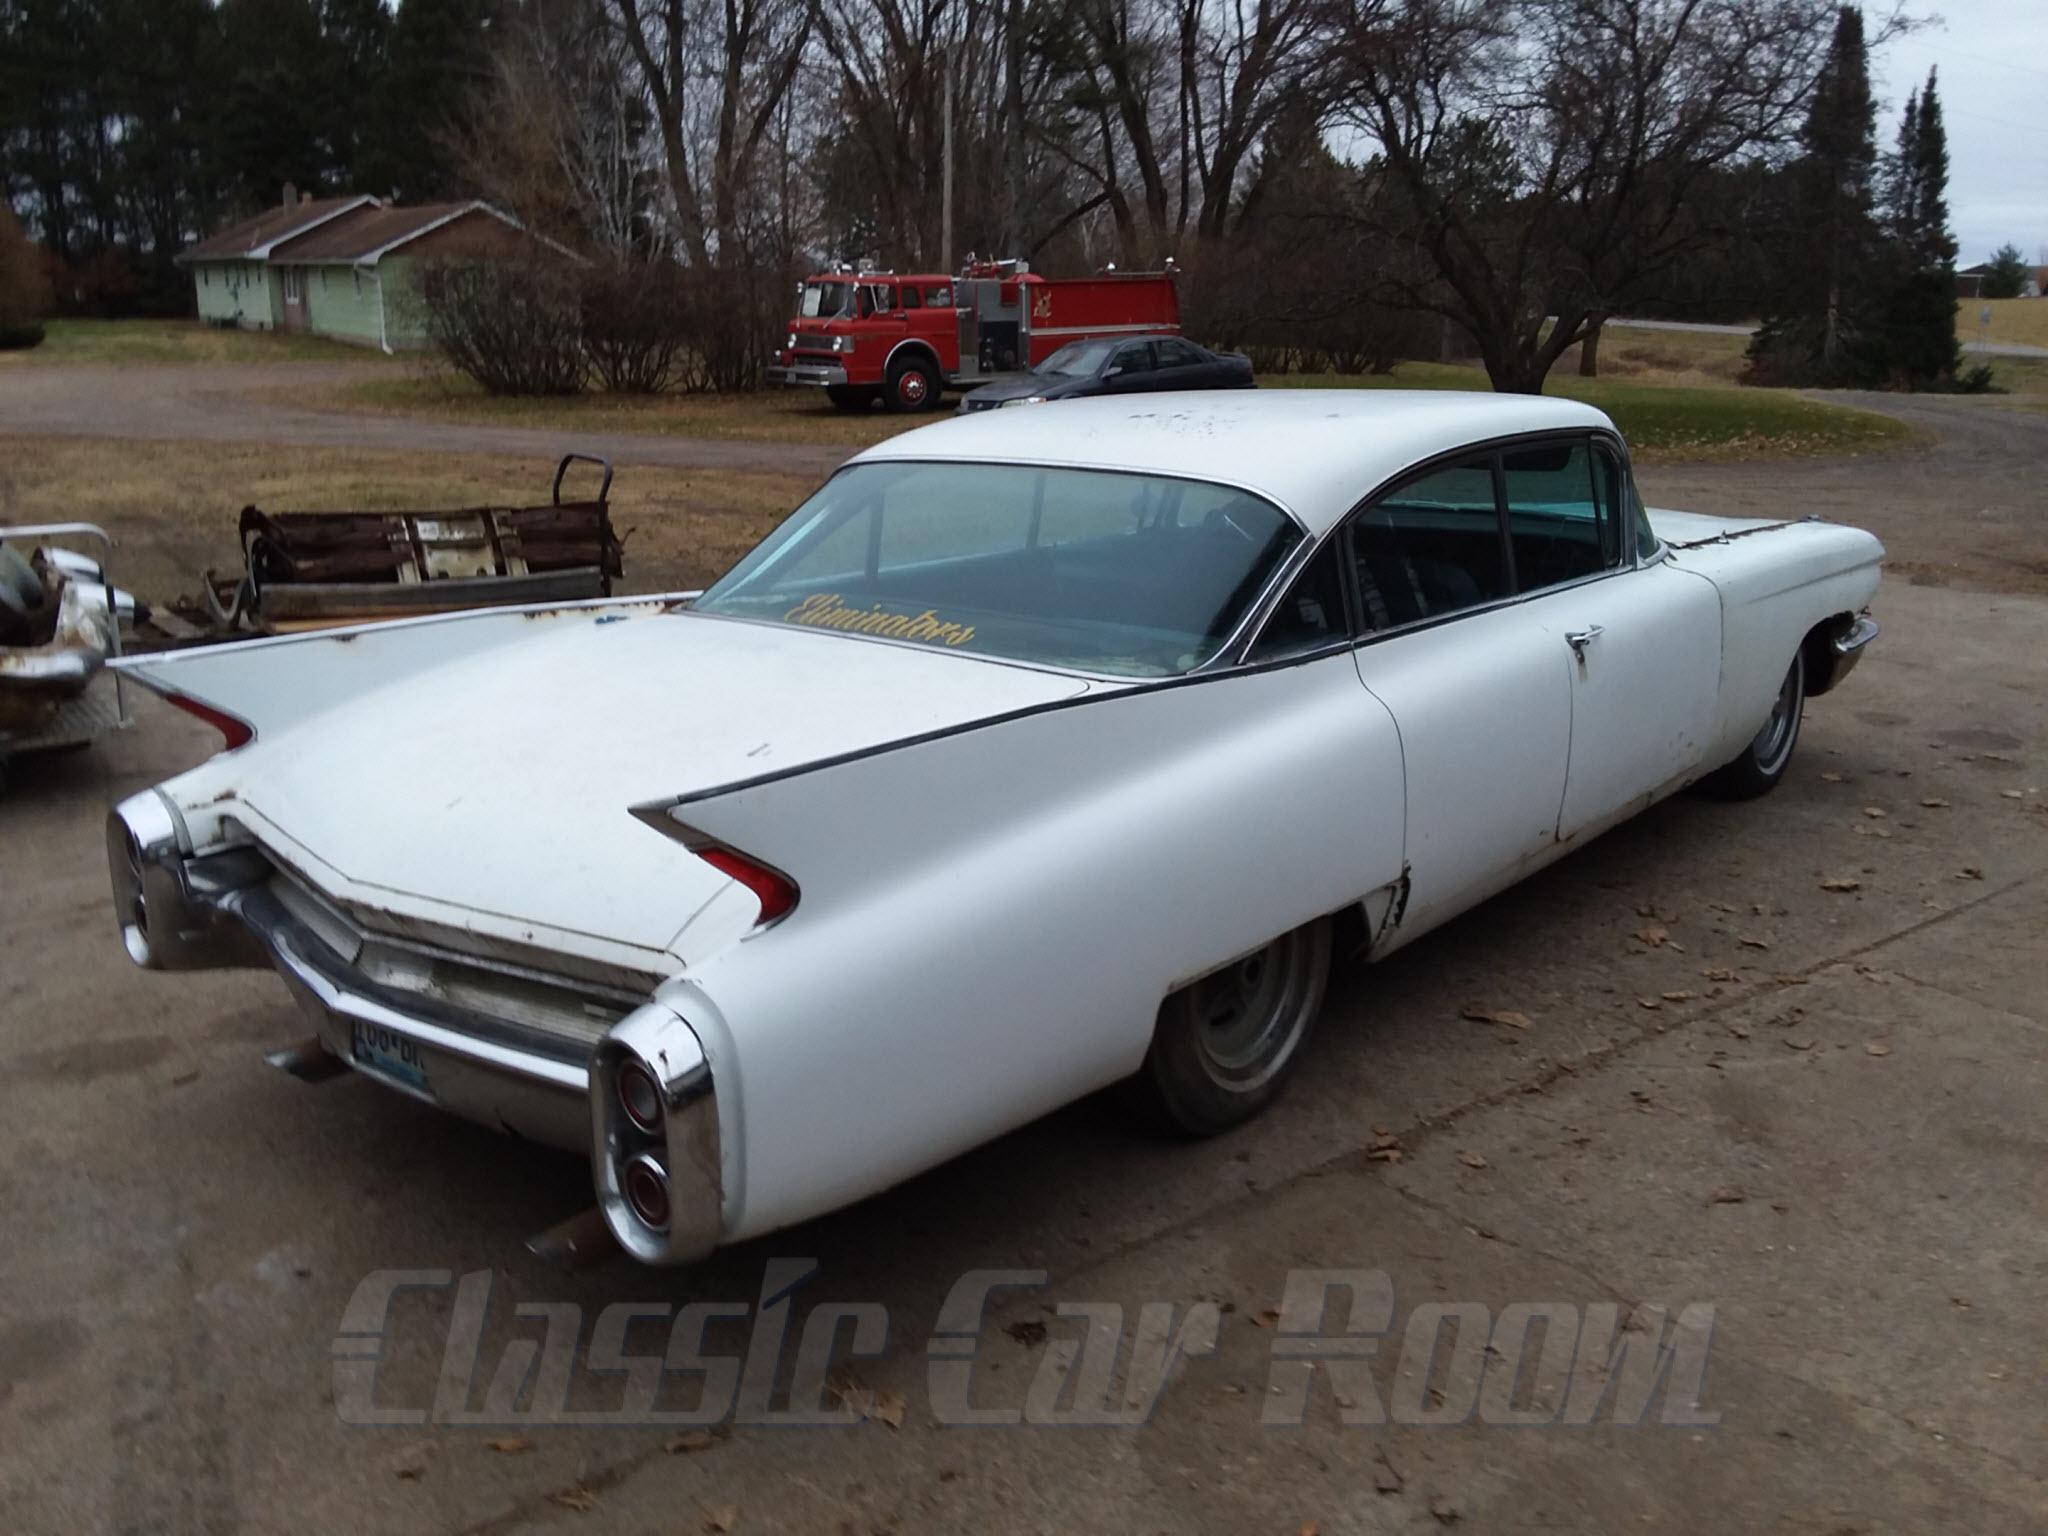 1960 Cadillac Rear